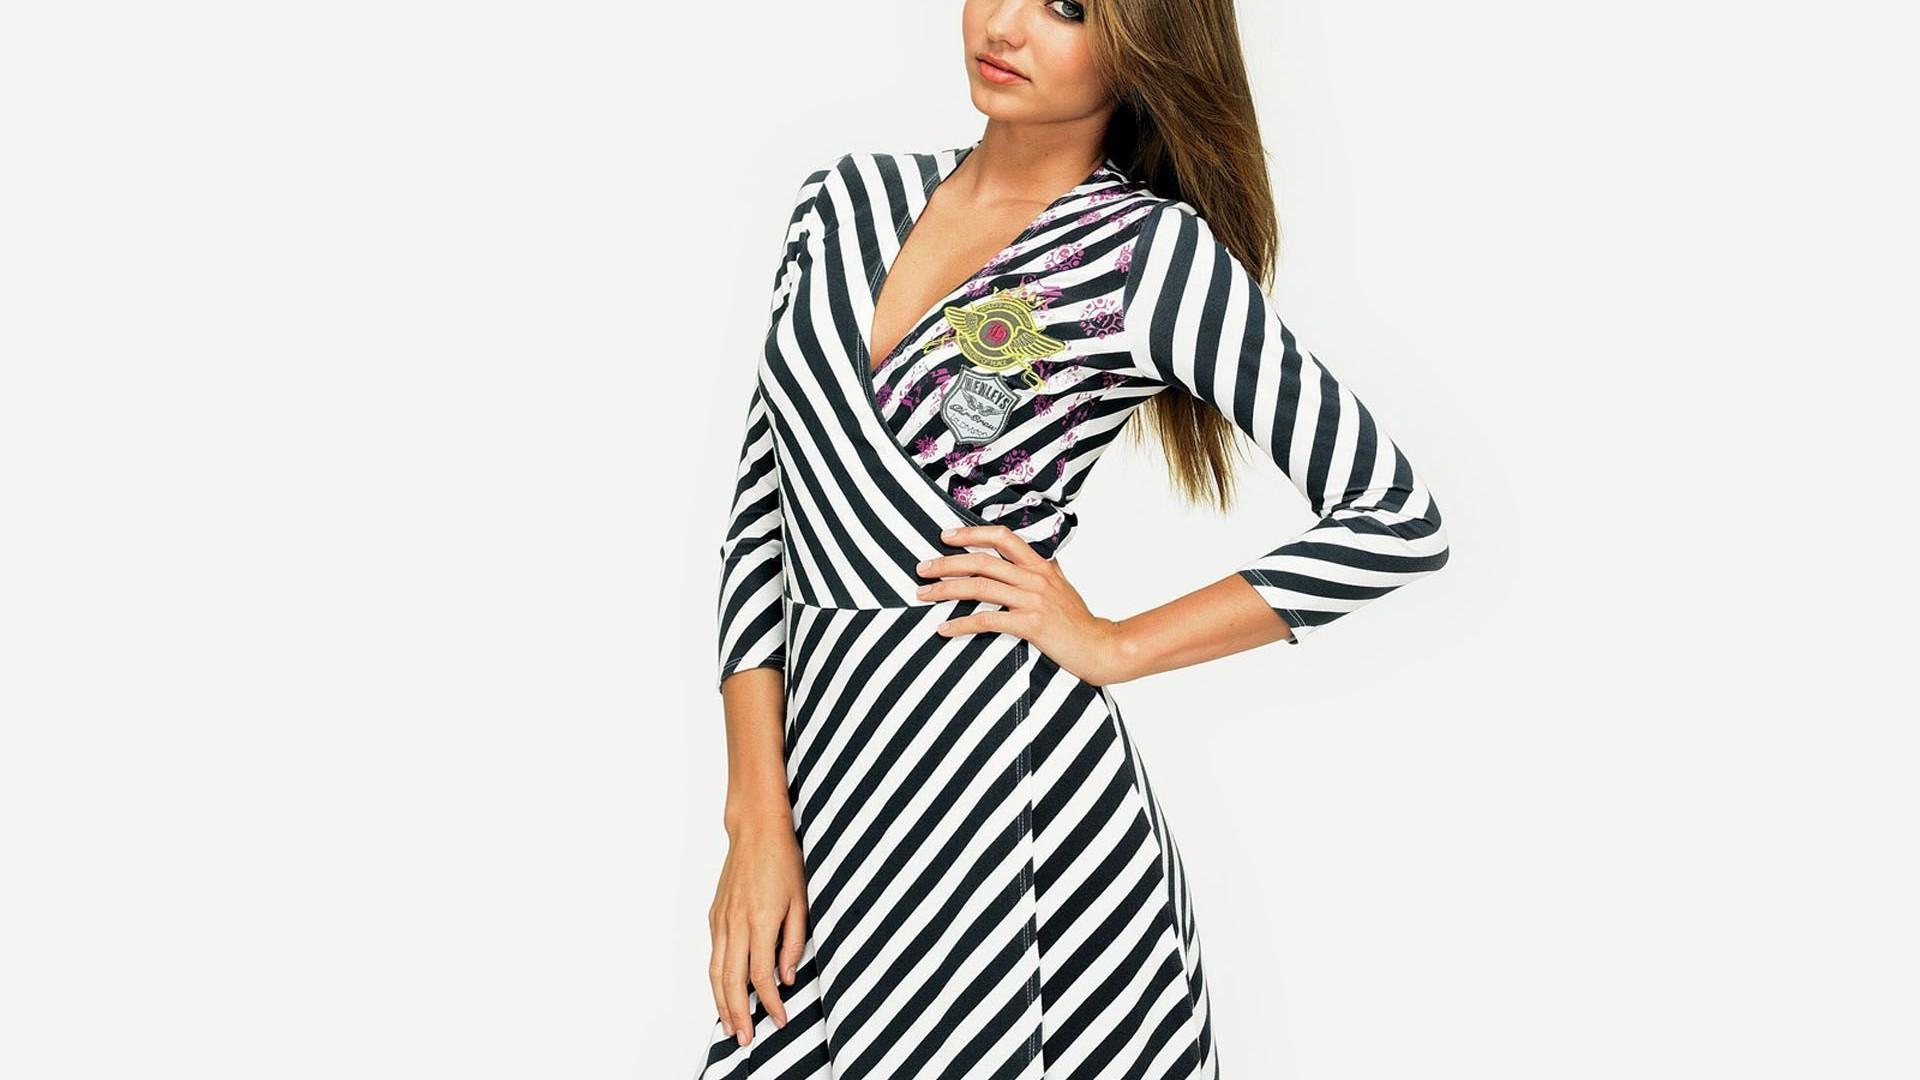 Miranda Kerr  Victoria s Secret Angels  Fashion Model   Free HD Wallpaper